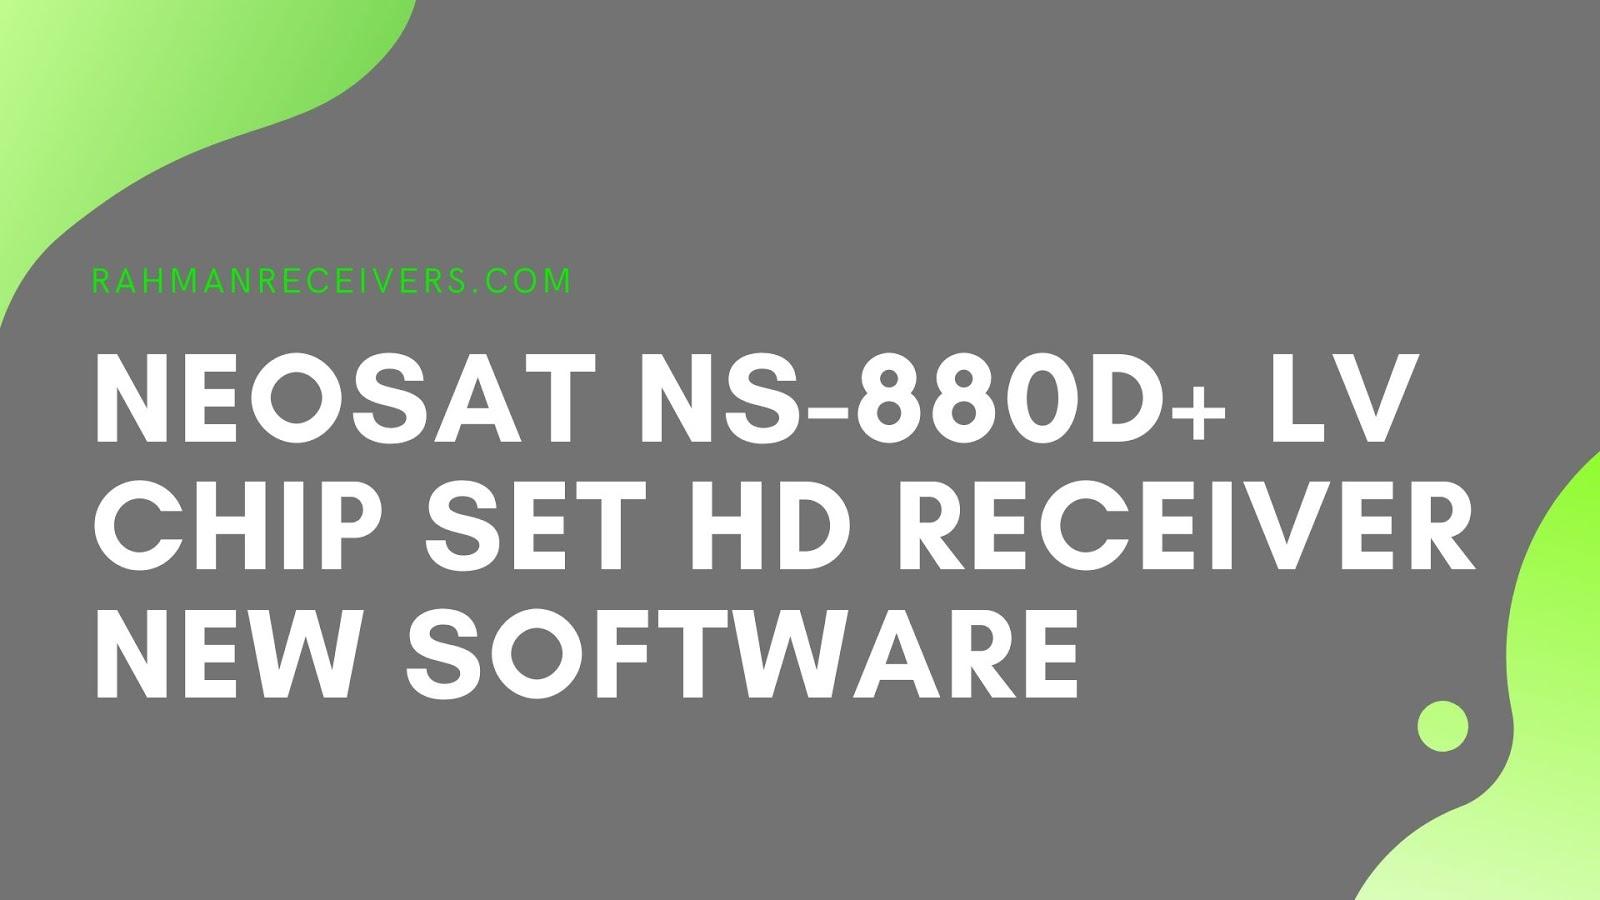 NEOSAT NS-880D+ LV CHIP SET HD RECEIVER NEW SOFTWARE